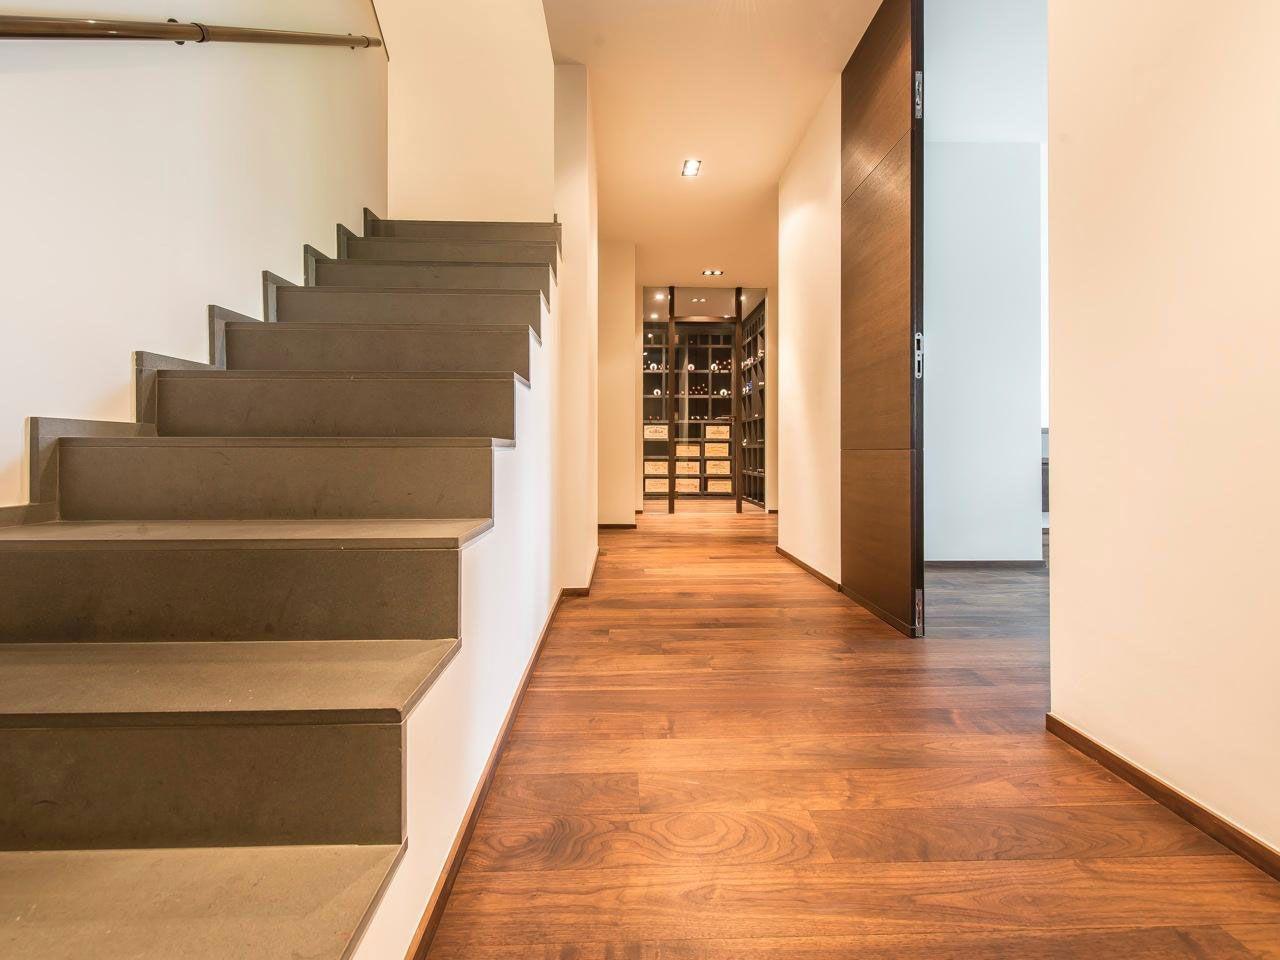 Chic Elegant Apartment in Brussels With Bright Interiors-14